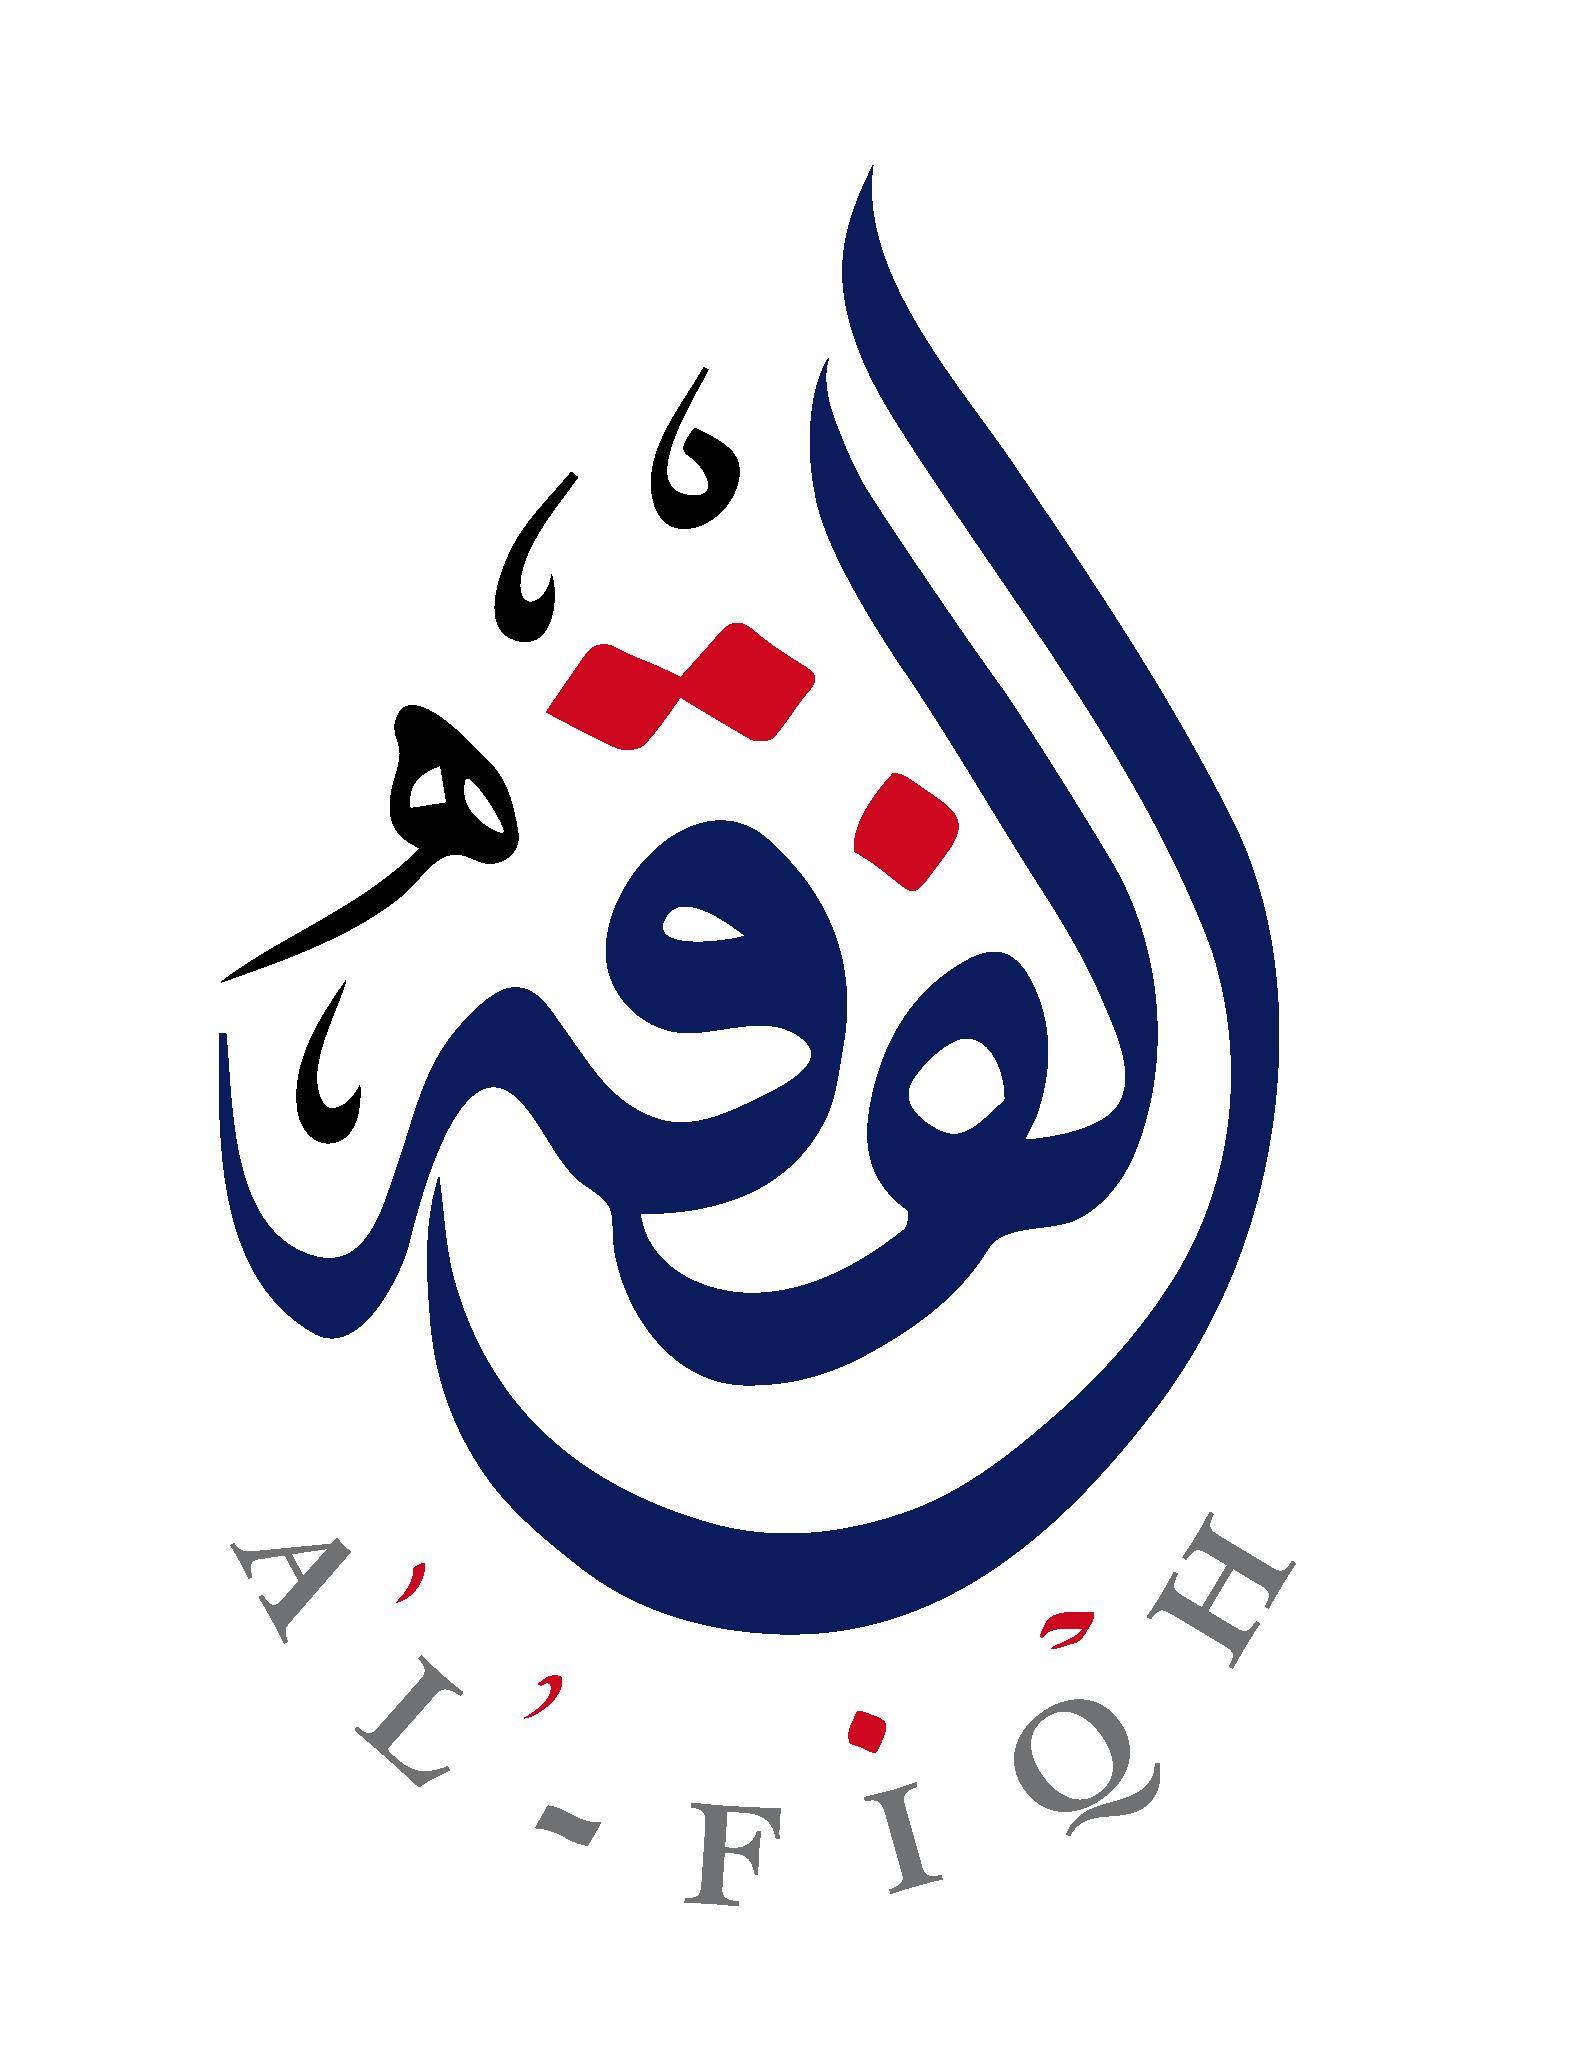 fiqh logo